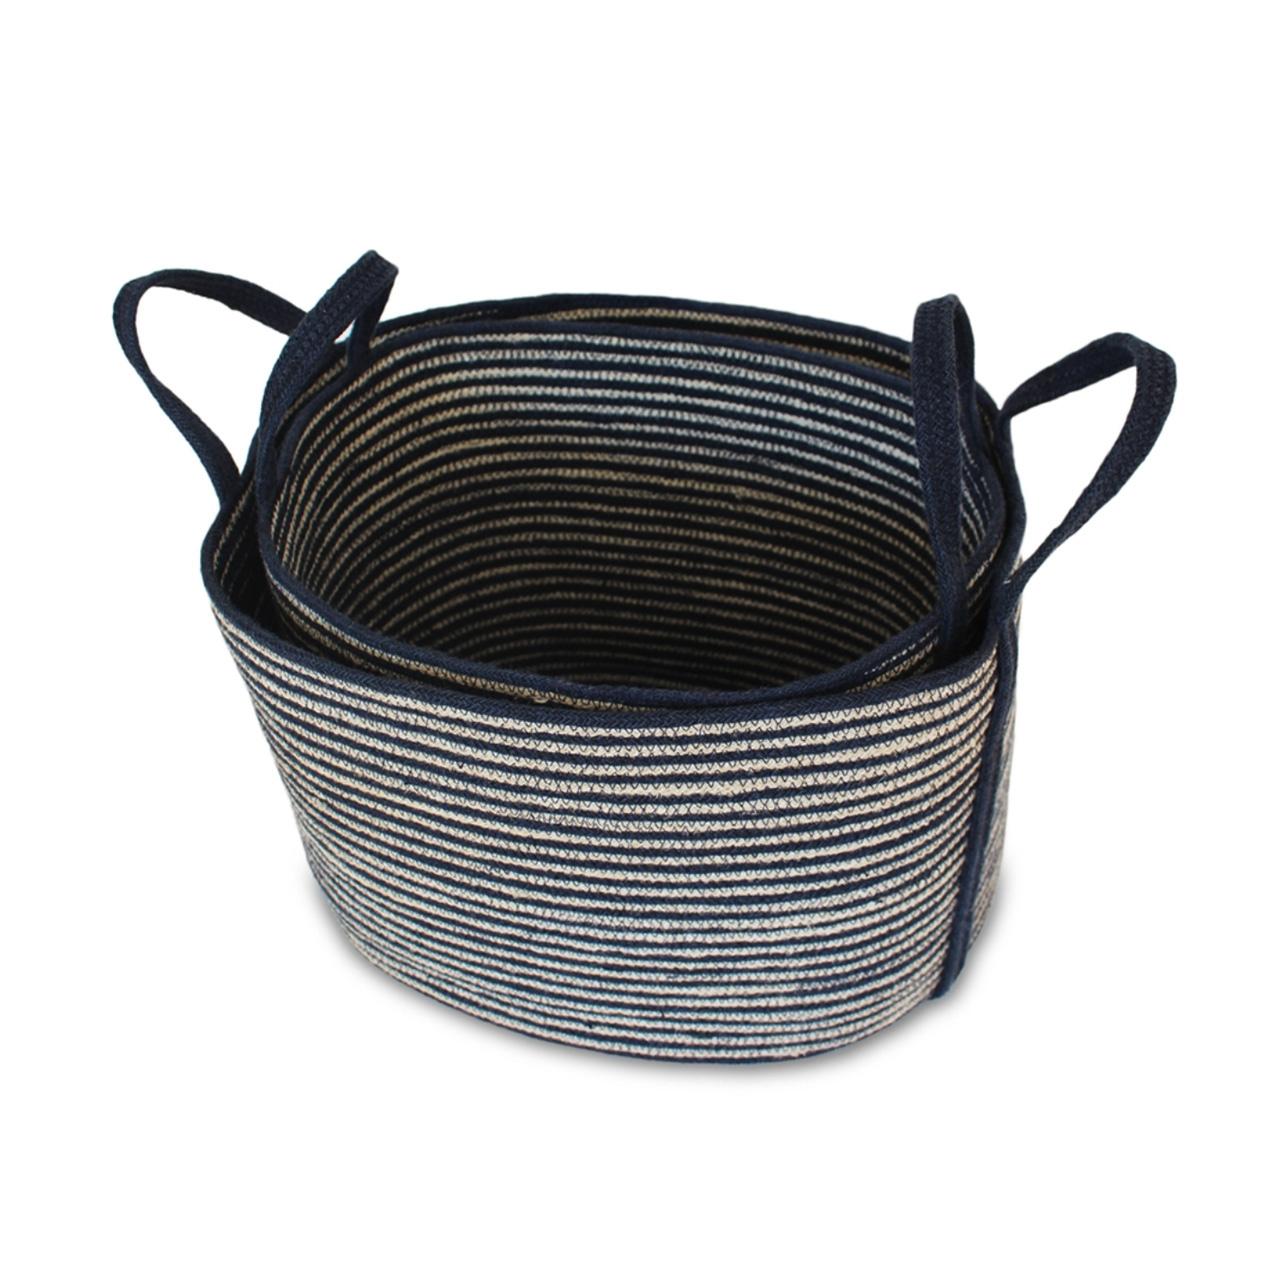 Jute Oval Tote Laundry Basket - Large-3